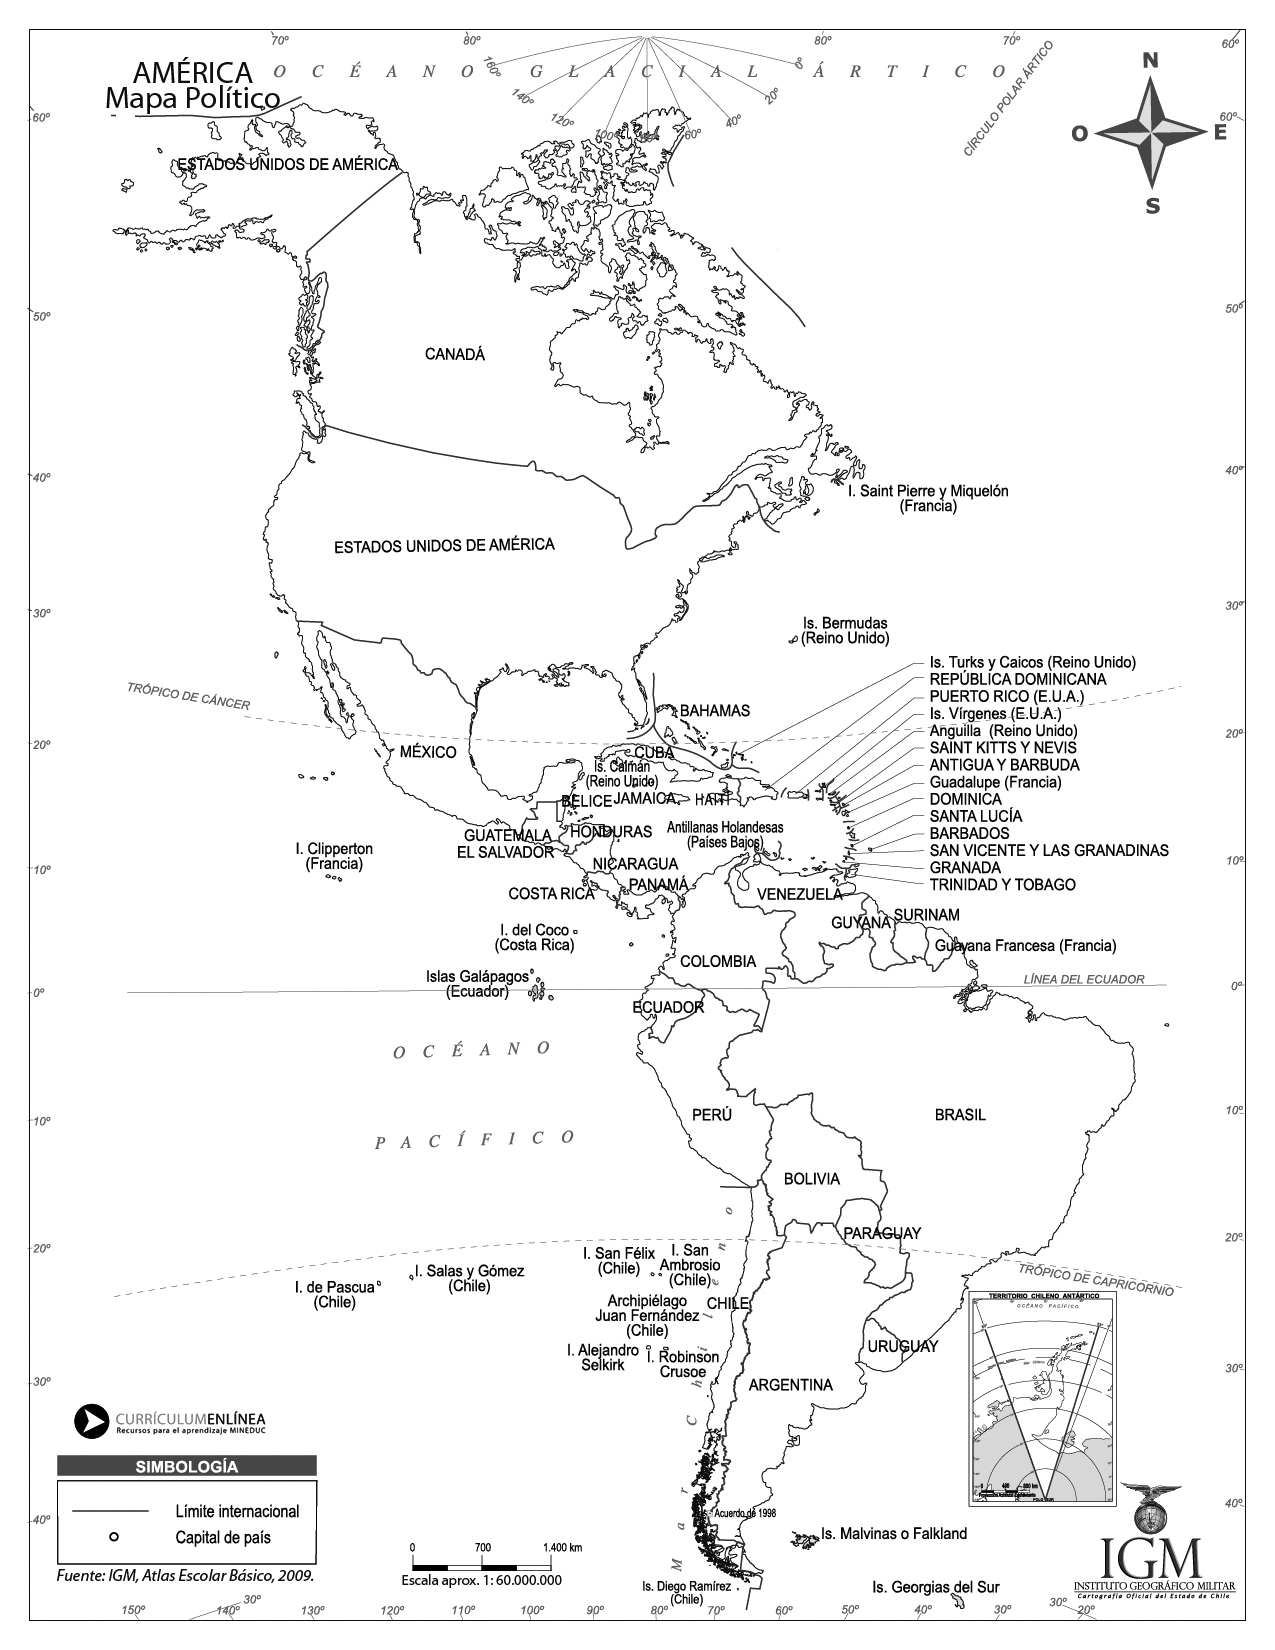 Worksheet. Mapa poltico de Amrica  Currculum en lnea MINEDUC Gobierno